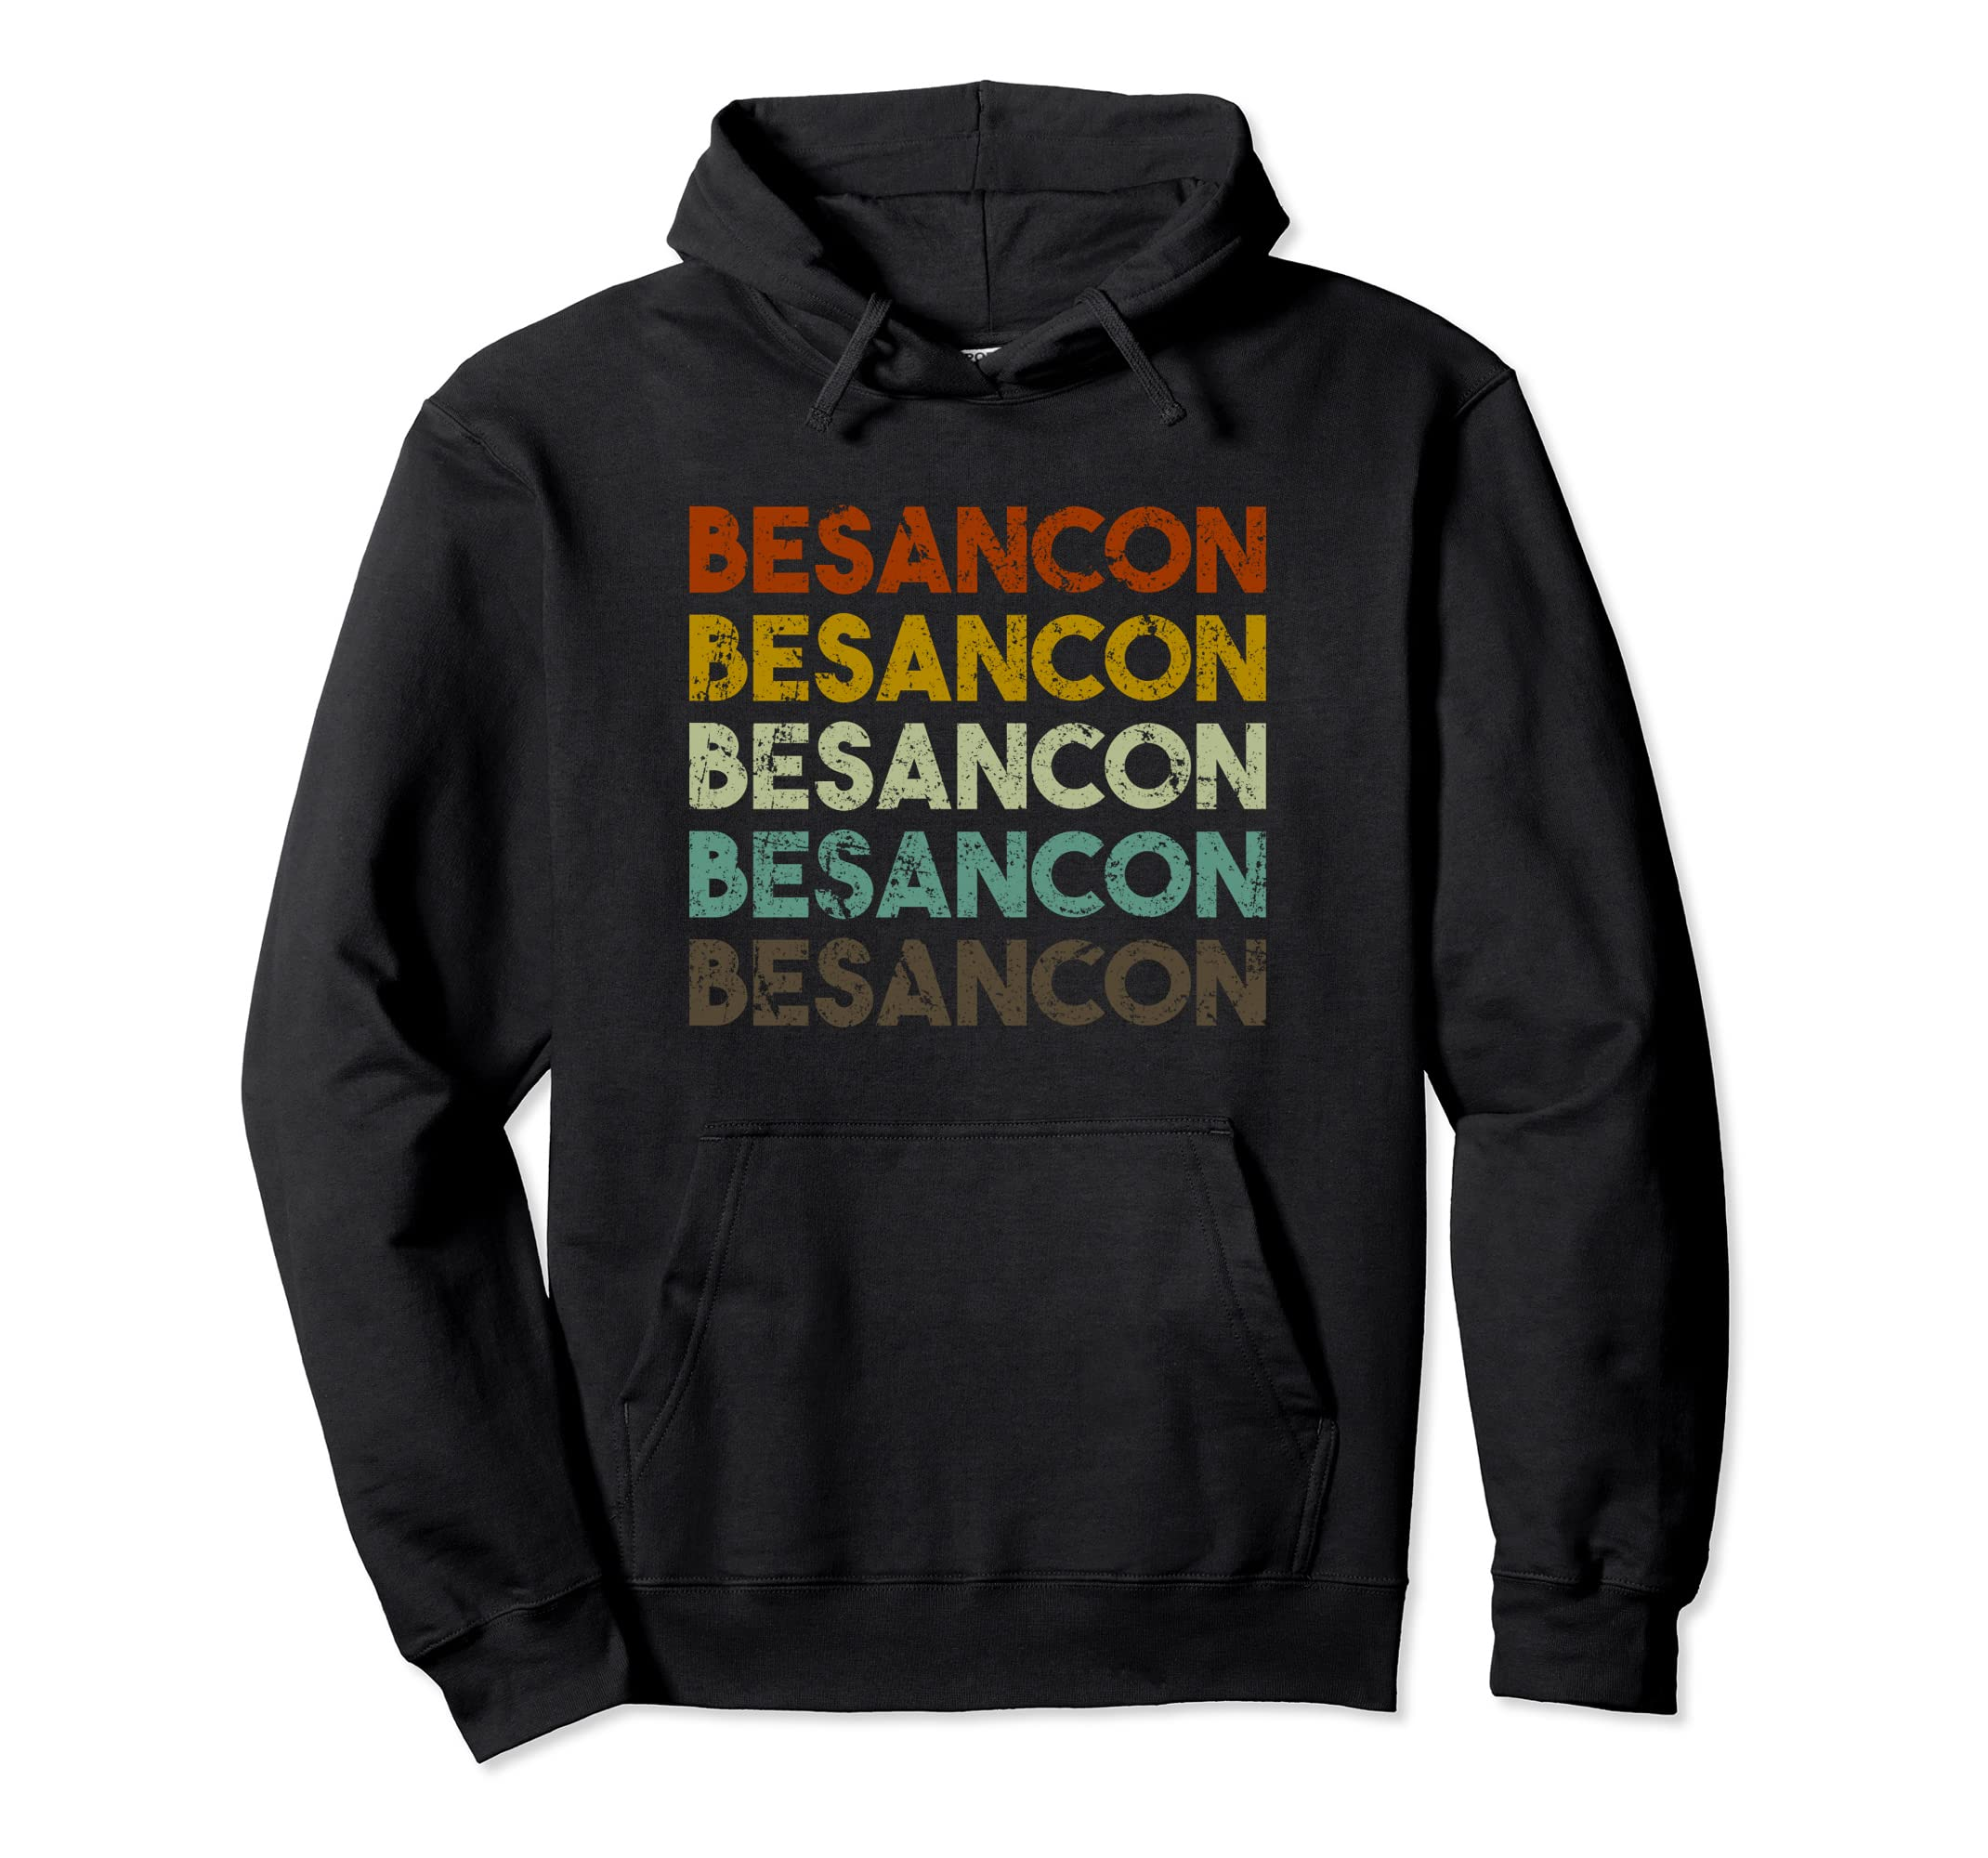 Besancon France   Classic Retro Vintage Pullover Hoodie-Colonhue